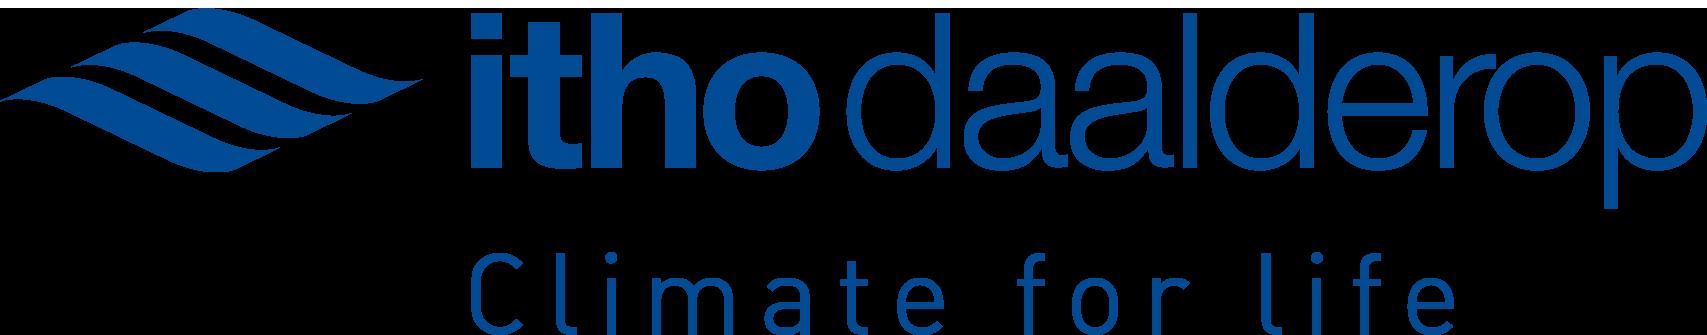 IthoDaalderop-warmtepompen